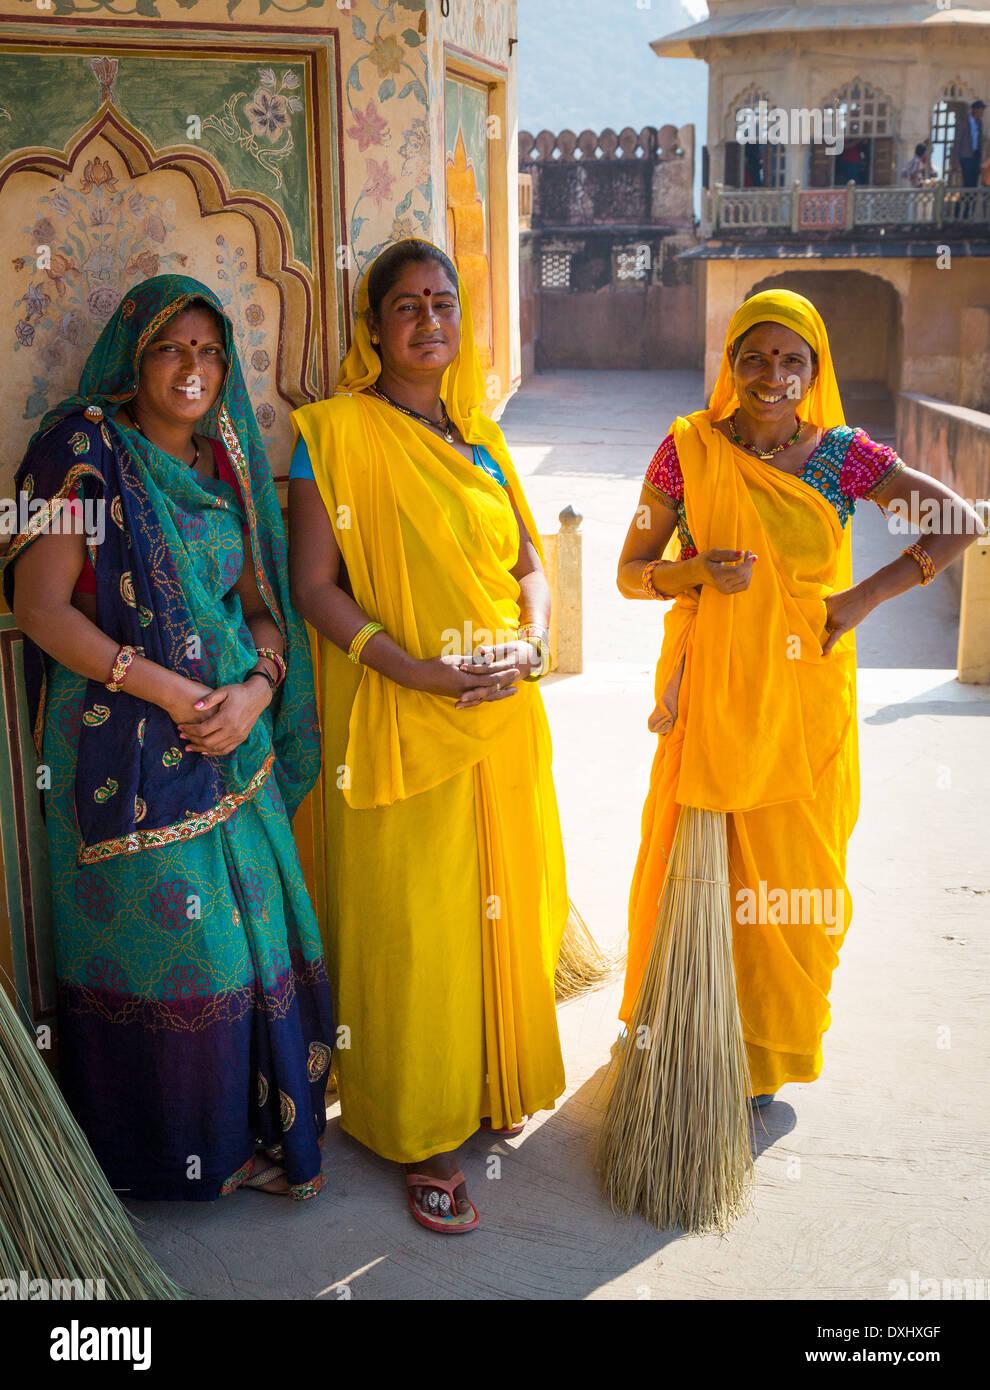 Le Donne indiane al Forte Amer, Rajasthan, India Immagini Stock